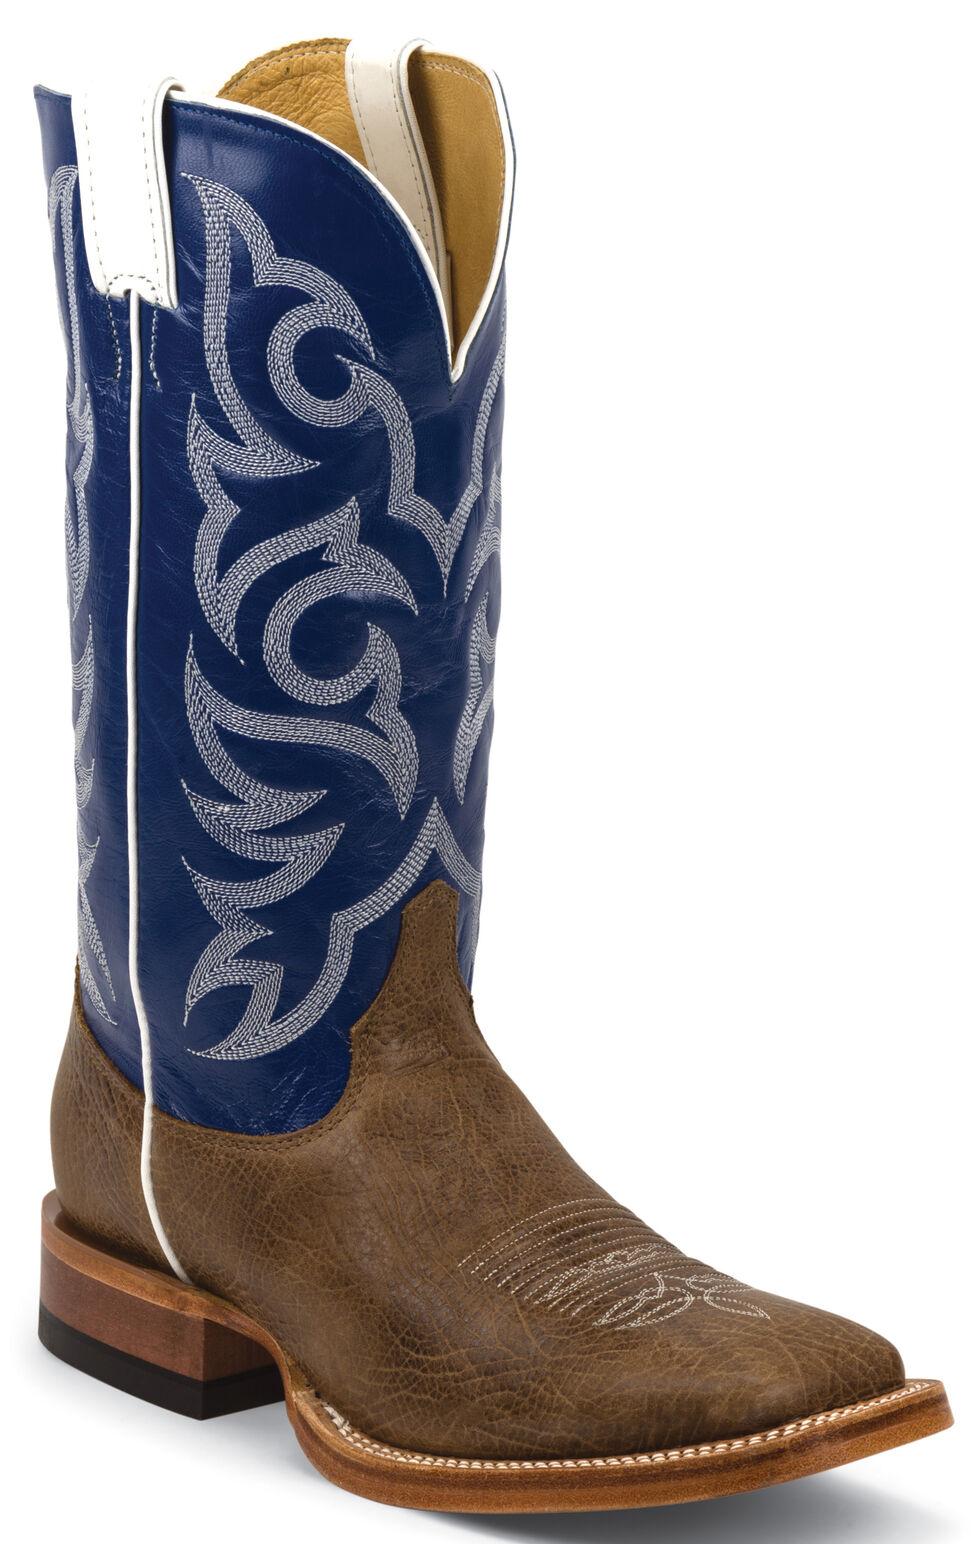 Justin Men's Brown Delta Cowhide Cowboy Boots - Square Toe, Brown, hi-res